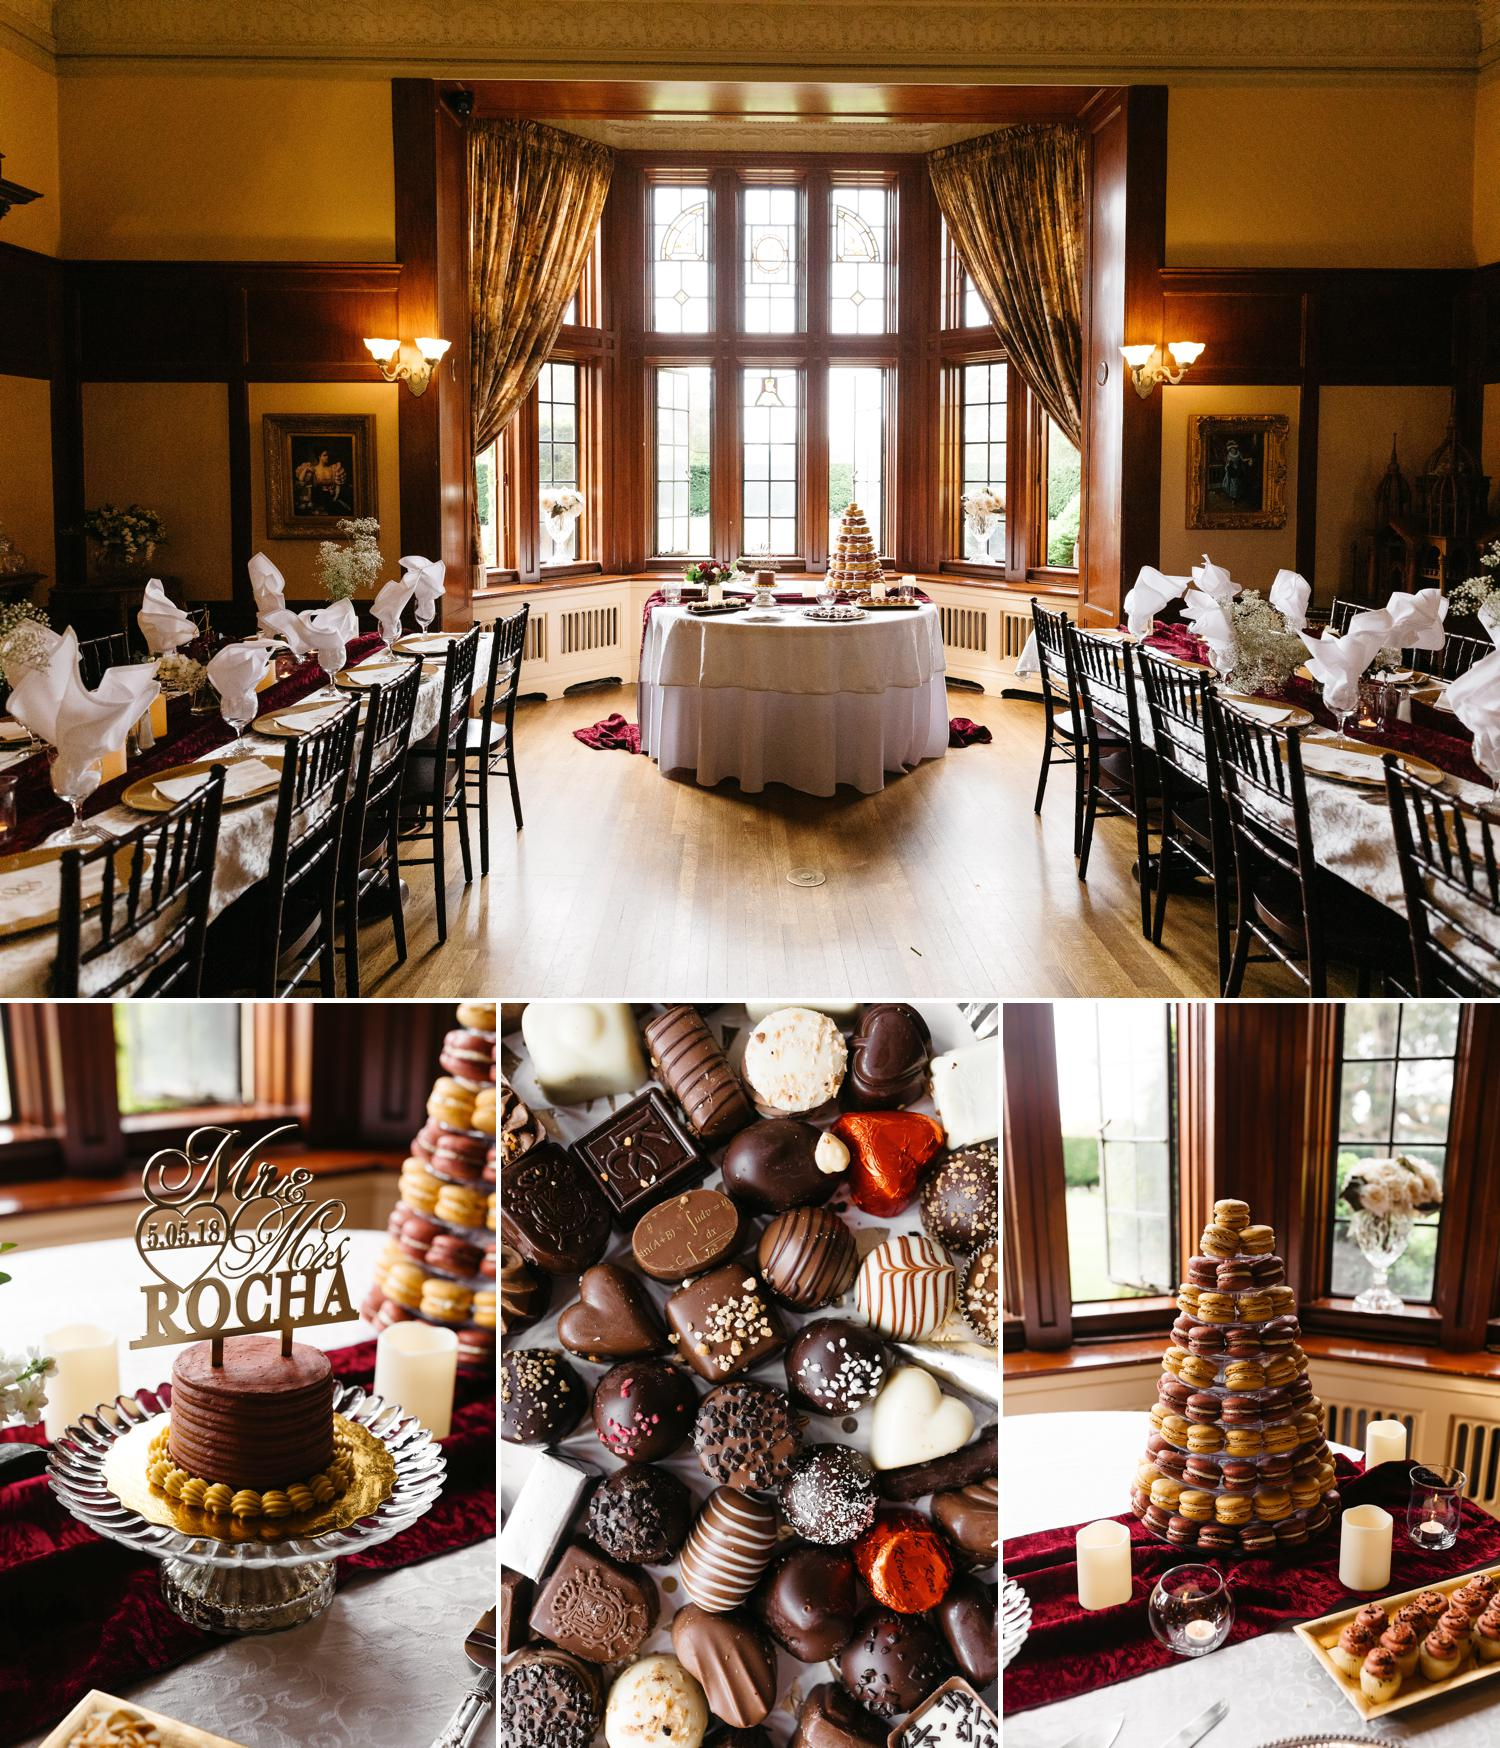 thornewood castle wedding dining hall